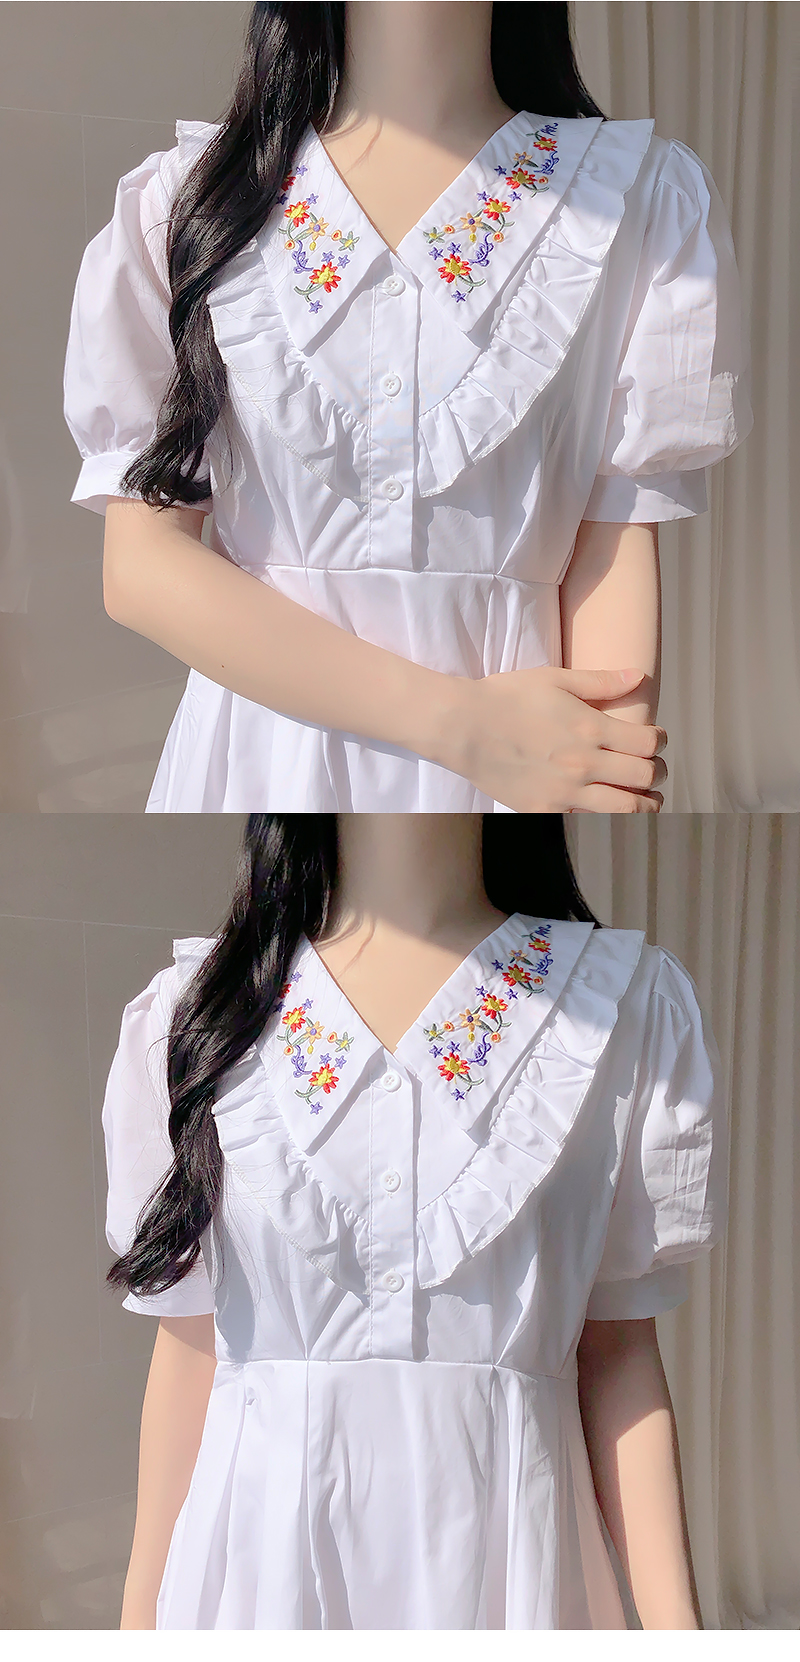 Kichi embroidery color dress